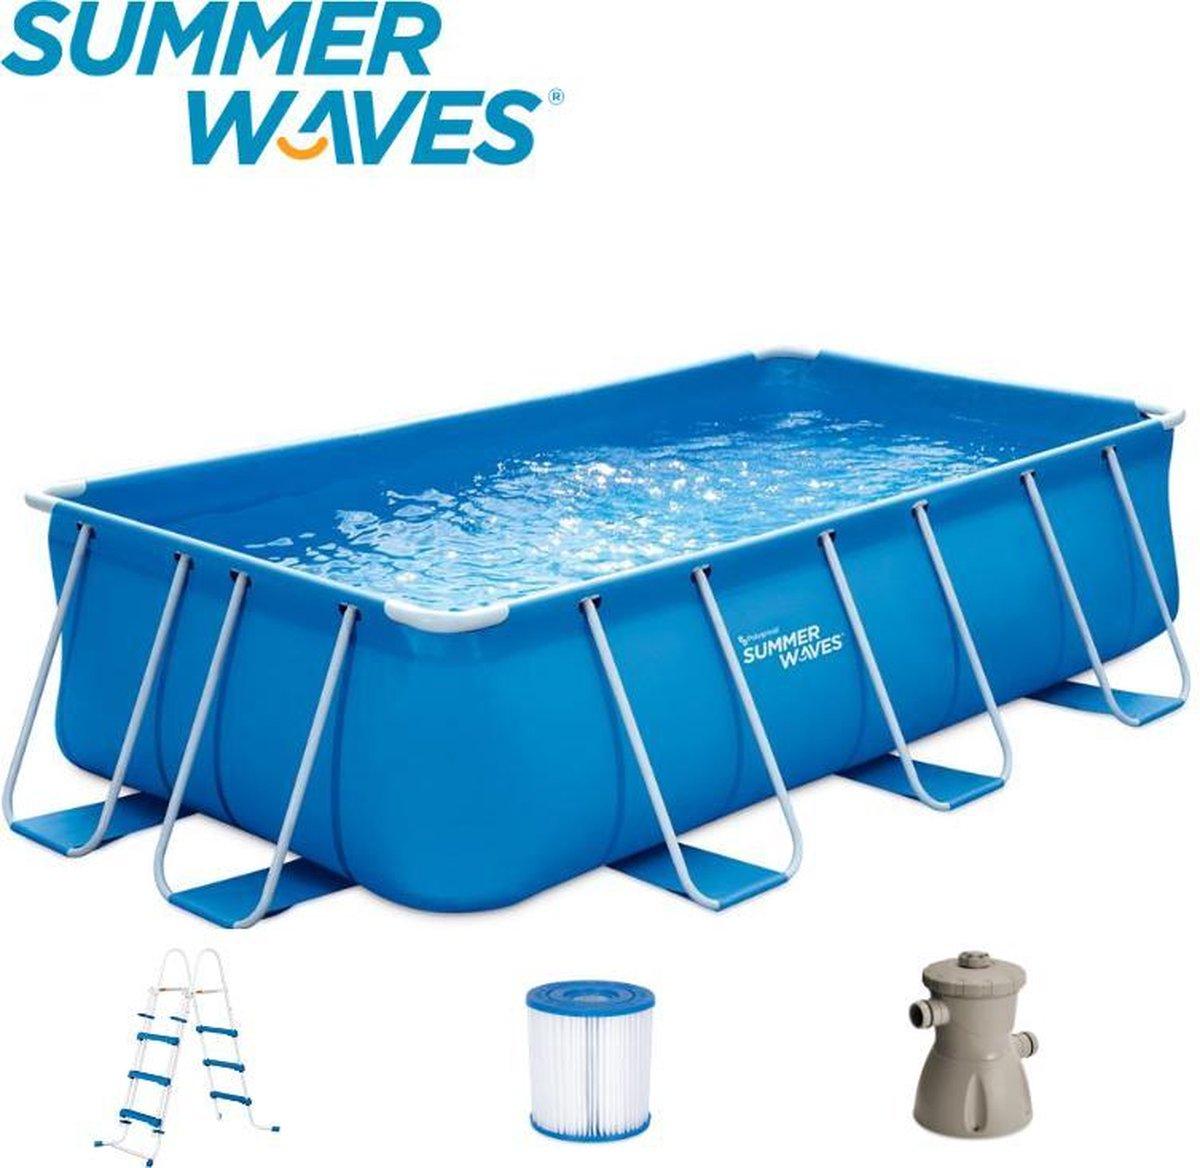 Summer Waves Frame Zwembad   Ø 400x cm x 213 x 100 cm   Inclusief Filterpomp   Inclusief Trap   Blauw